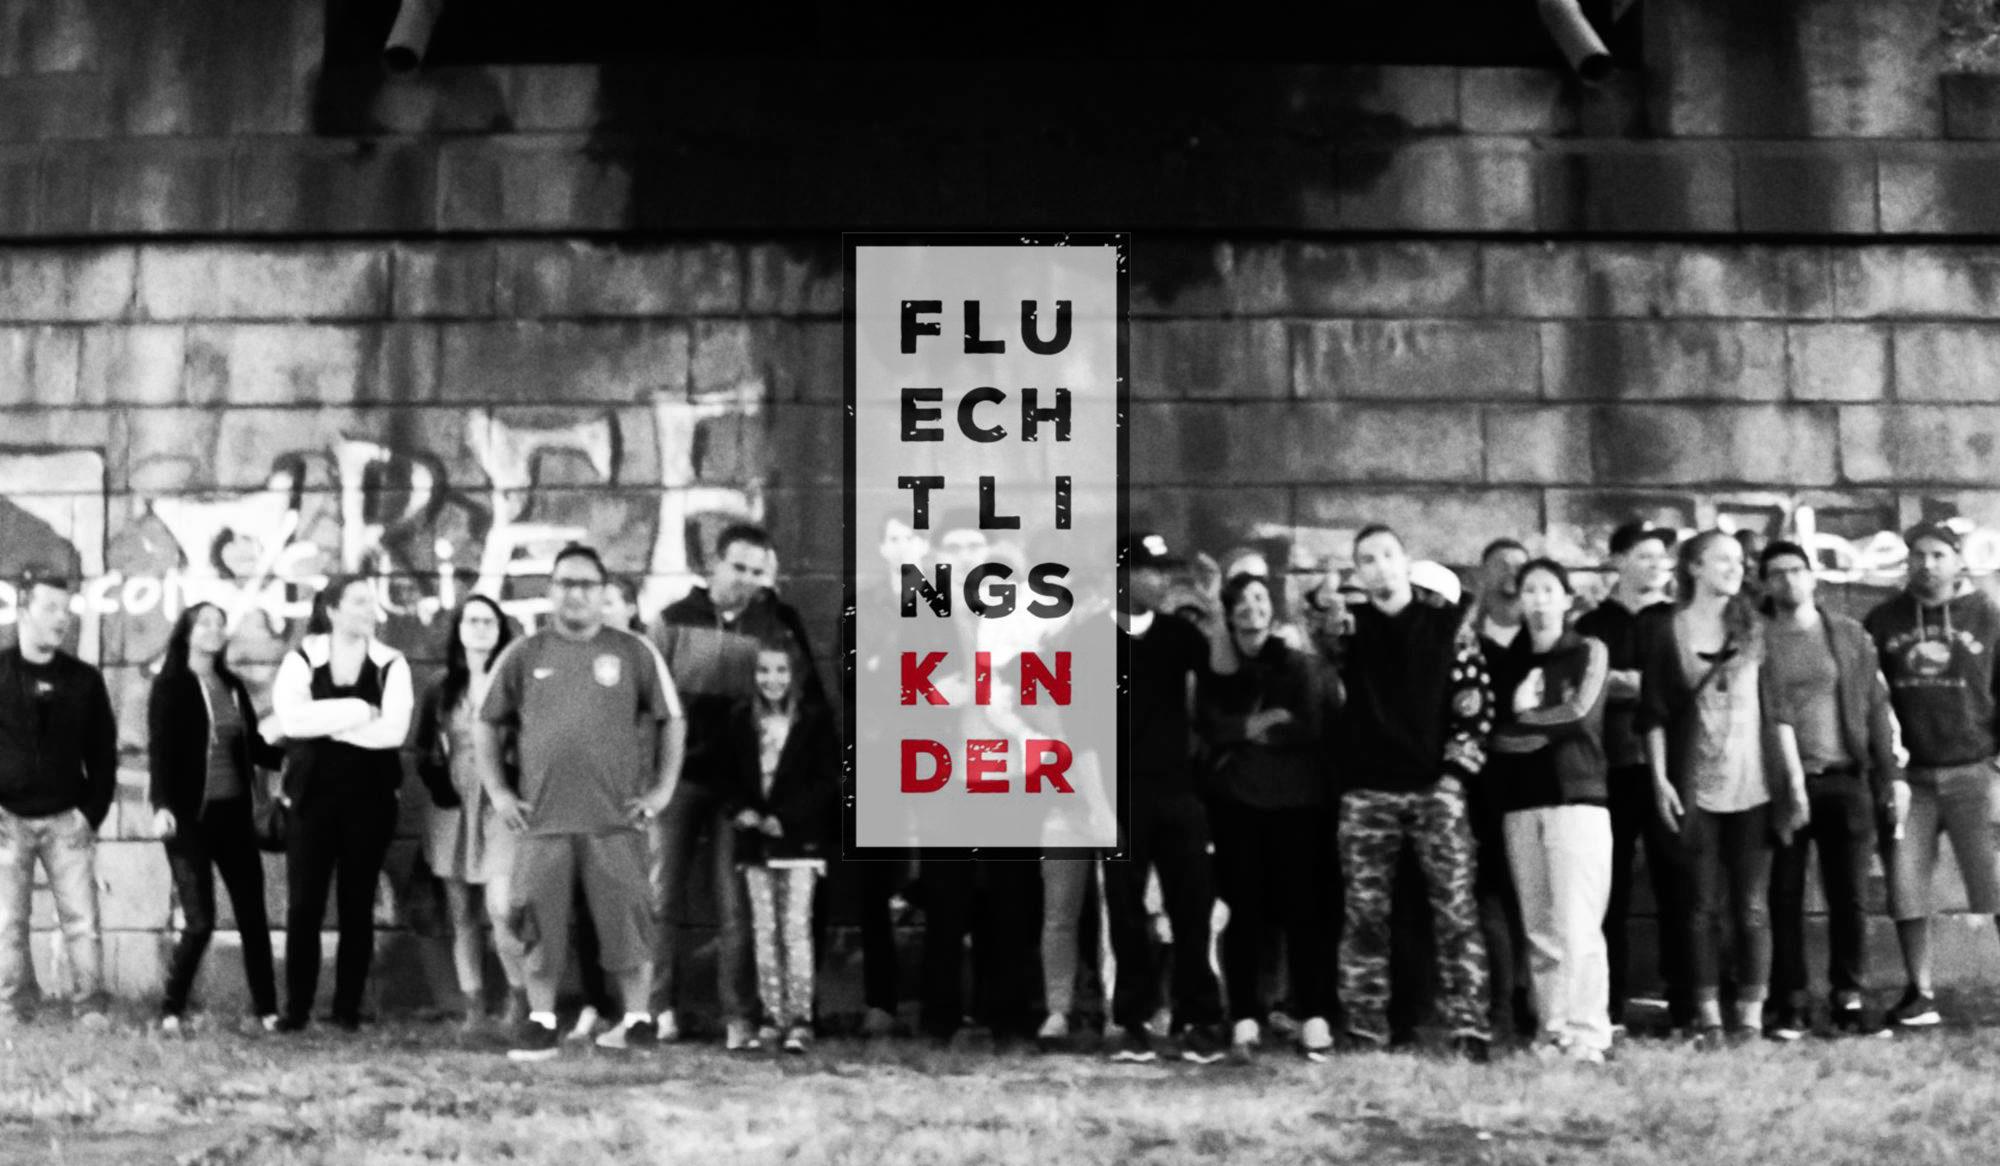 Flüchtlingskinder Projekt, 99 Probleme, Flüchtlinge, Rapper, Rap-Song, Patrick Catuz